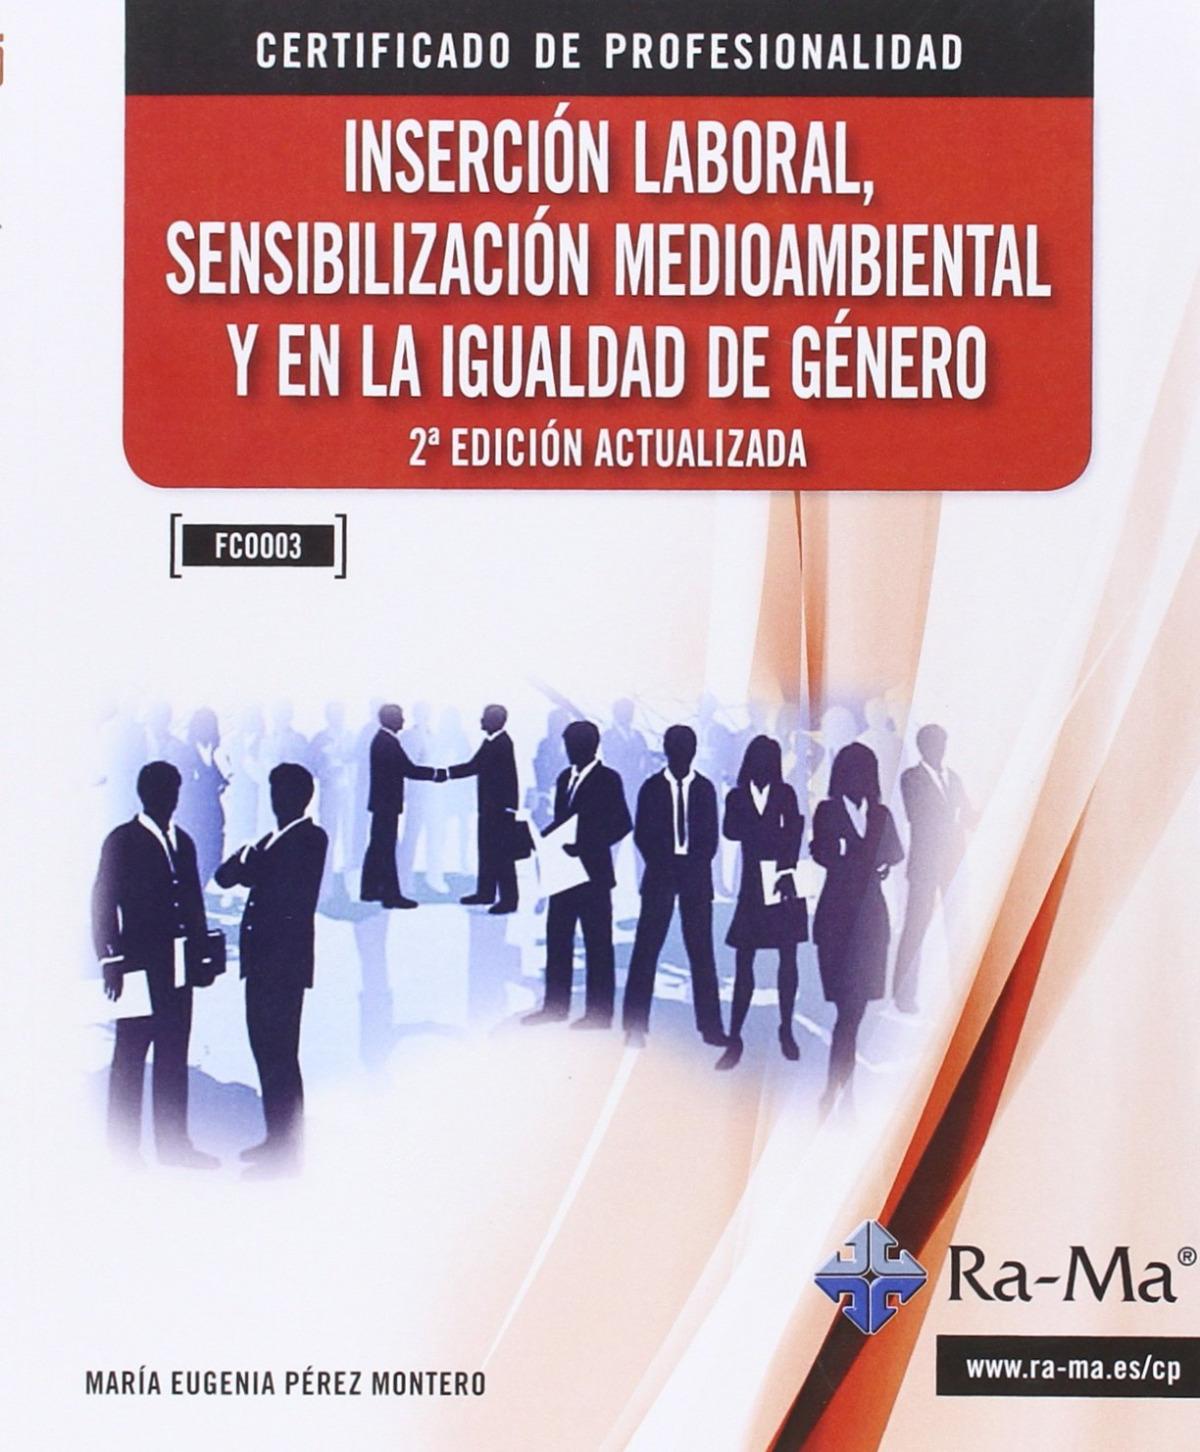 INSERCION LABORAL, SENSIB.MEDIOAMBIENTAL (2a.) (FCOO03) 9788499645315